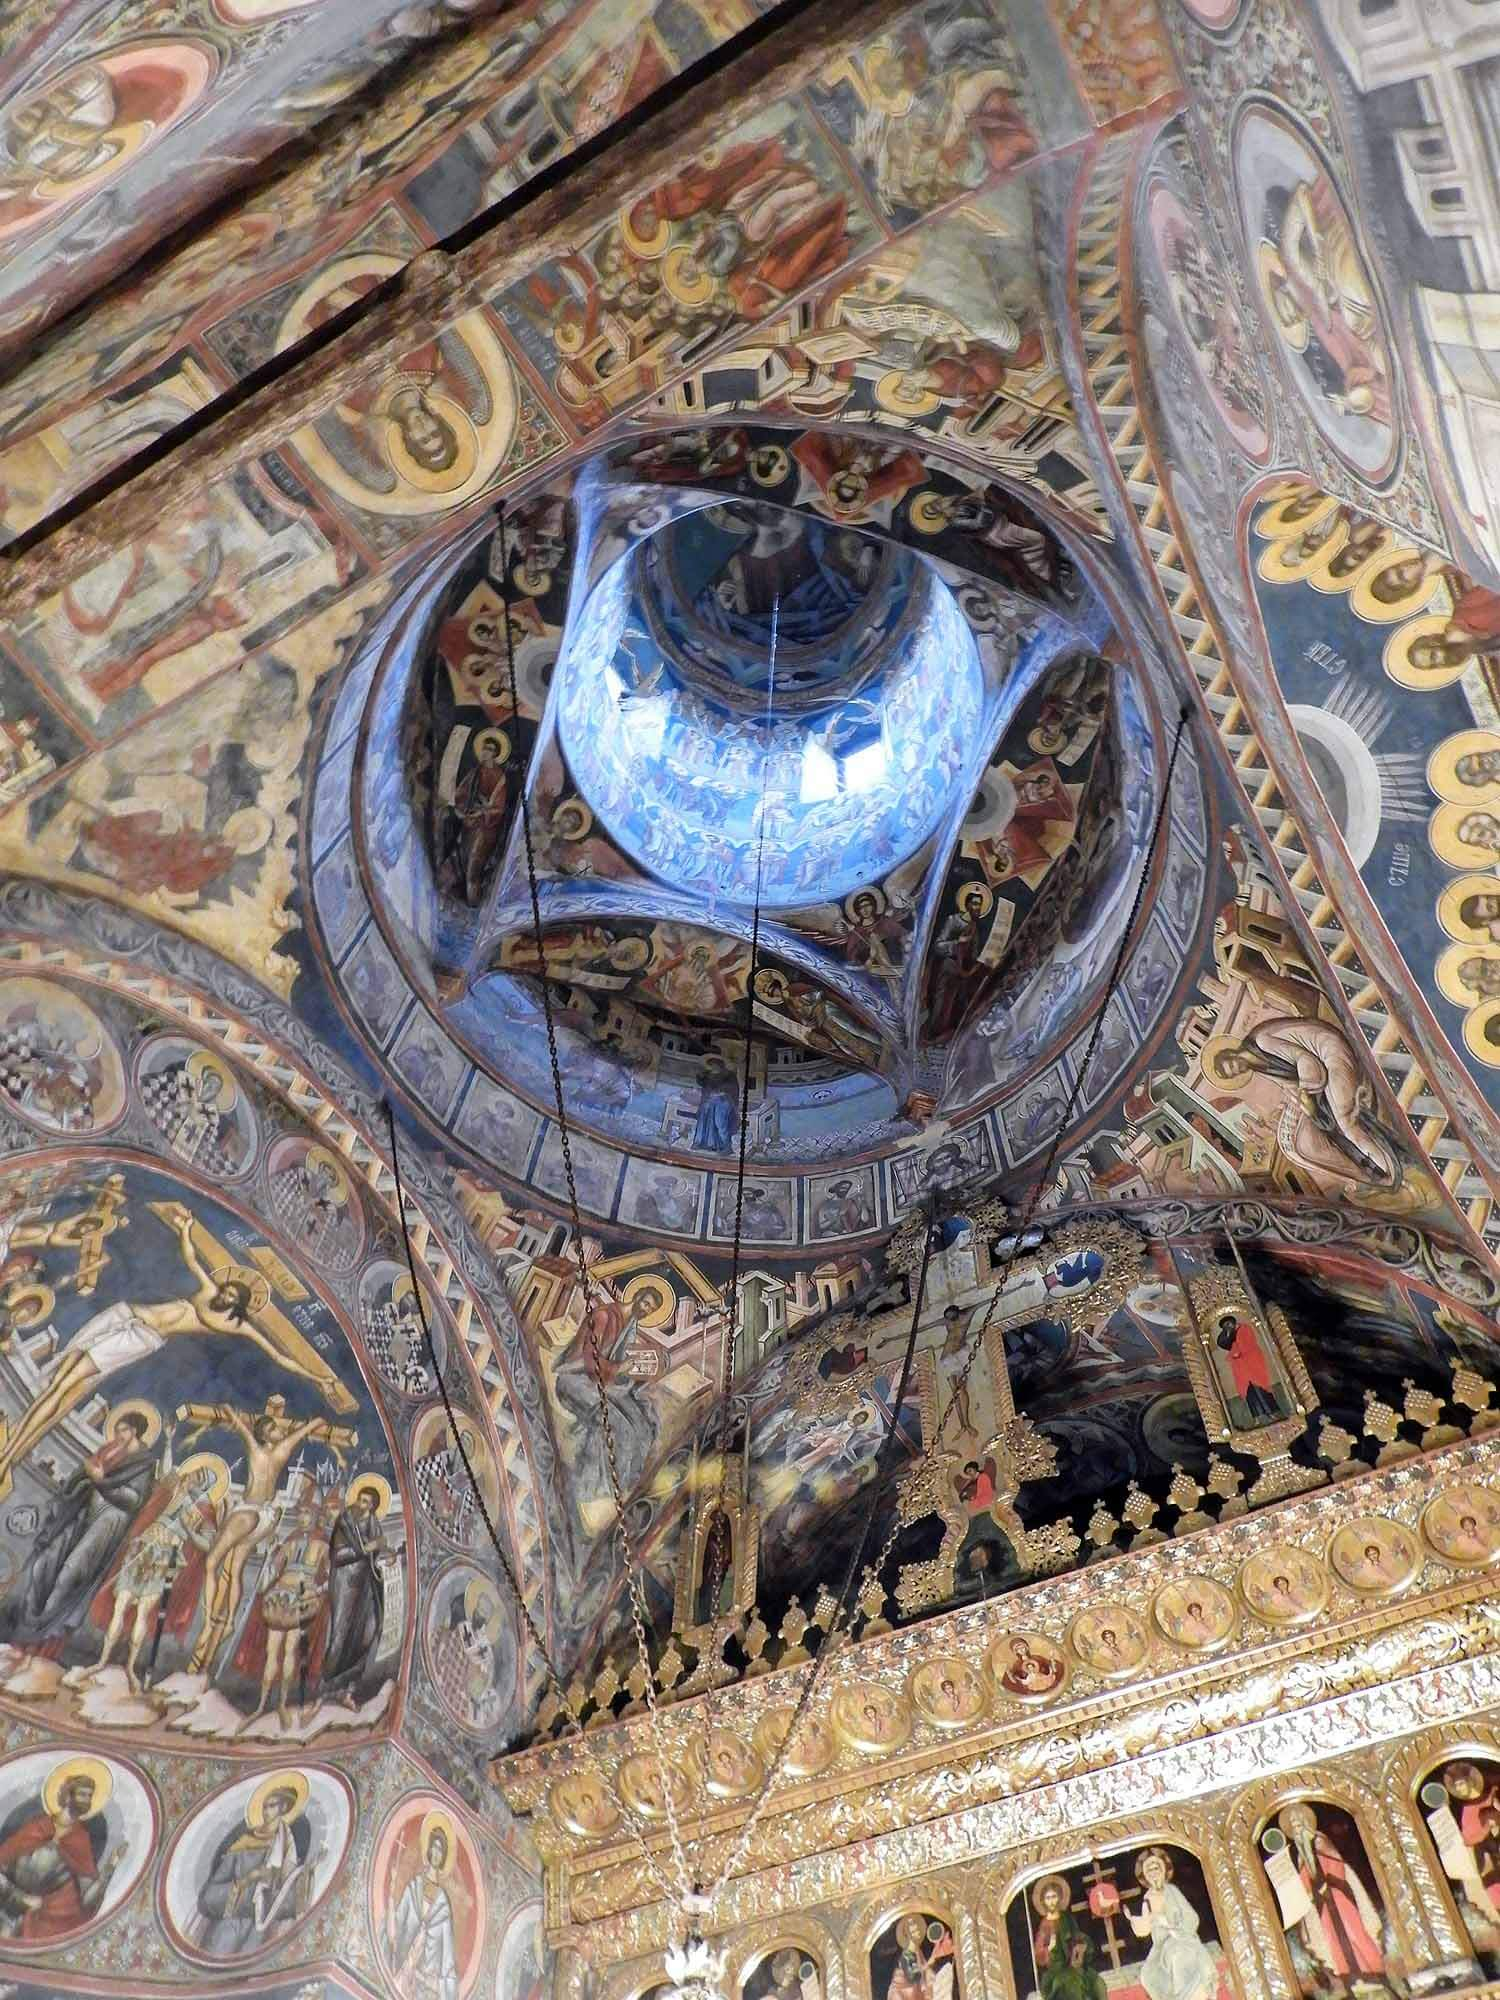 romania-bucovina-moldovita-painted-monasteries (4).jpg